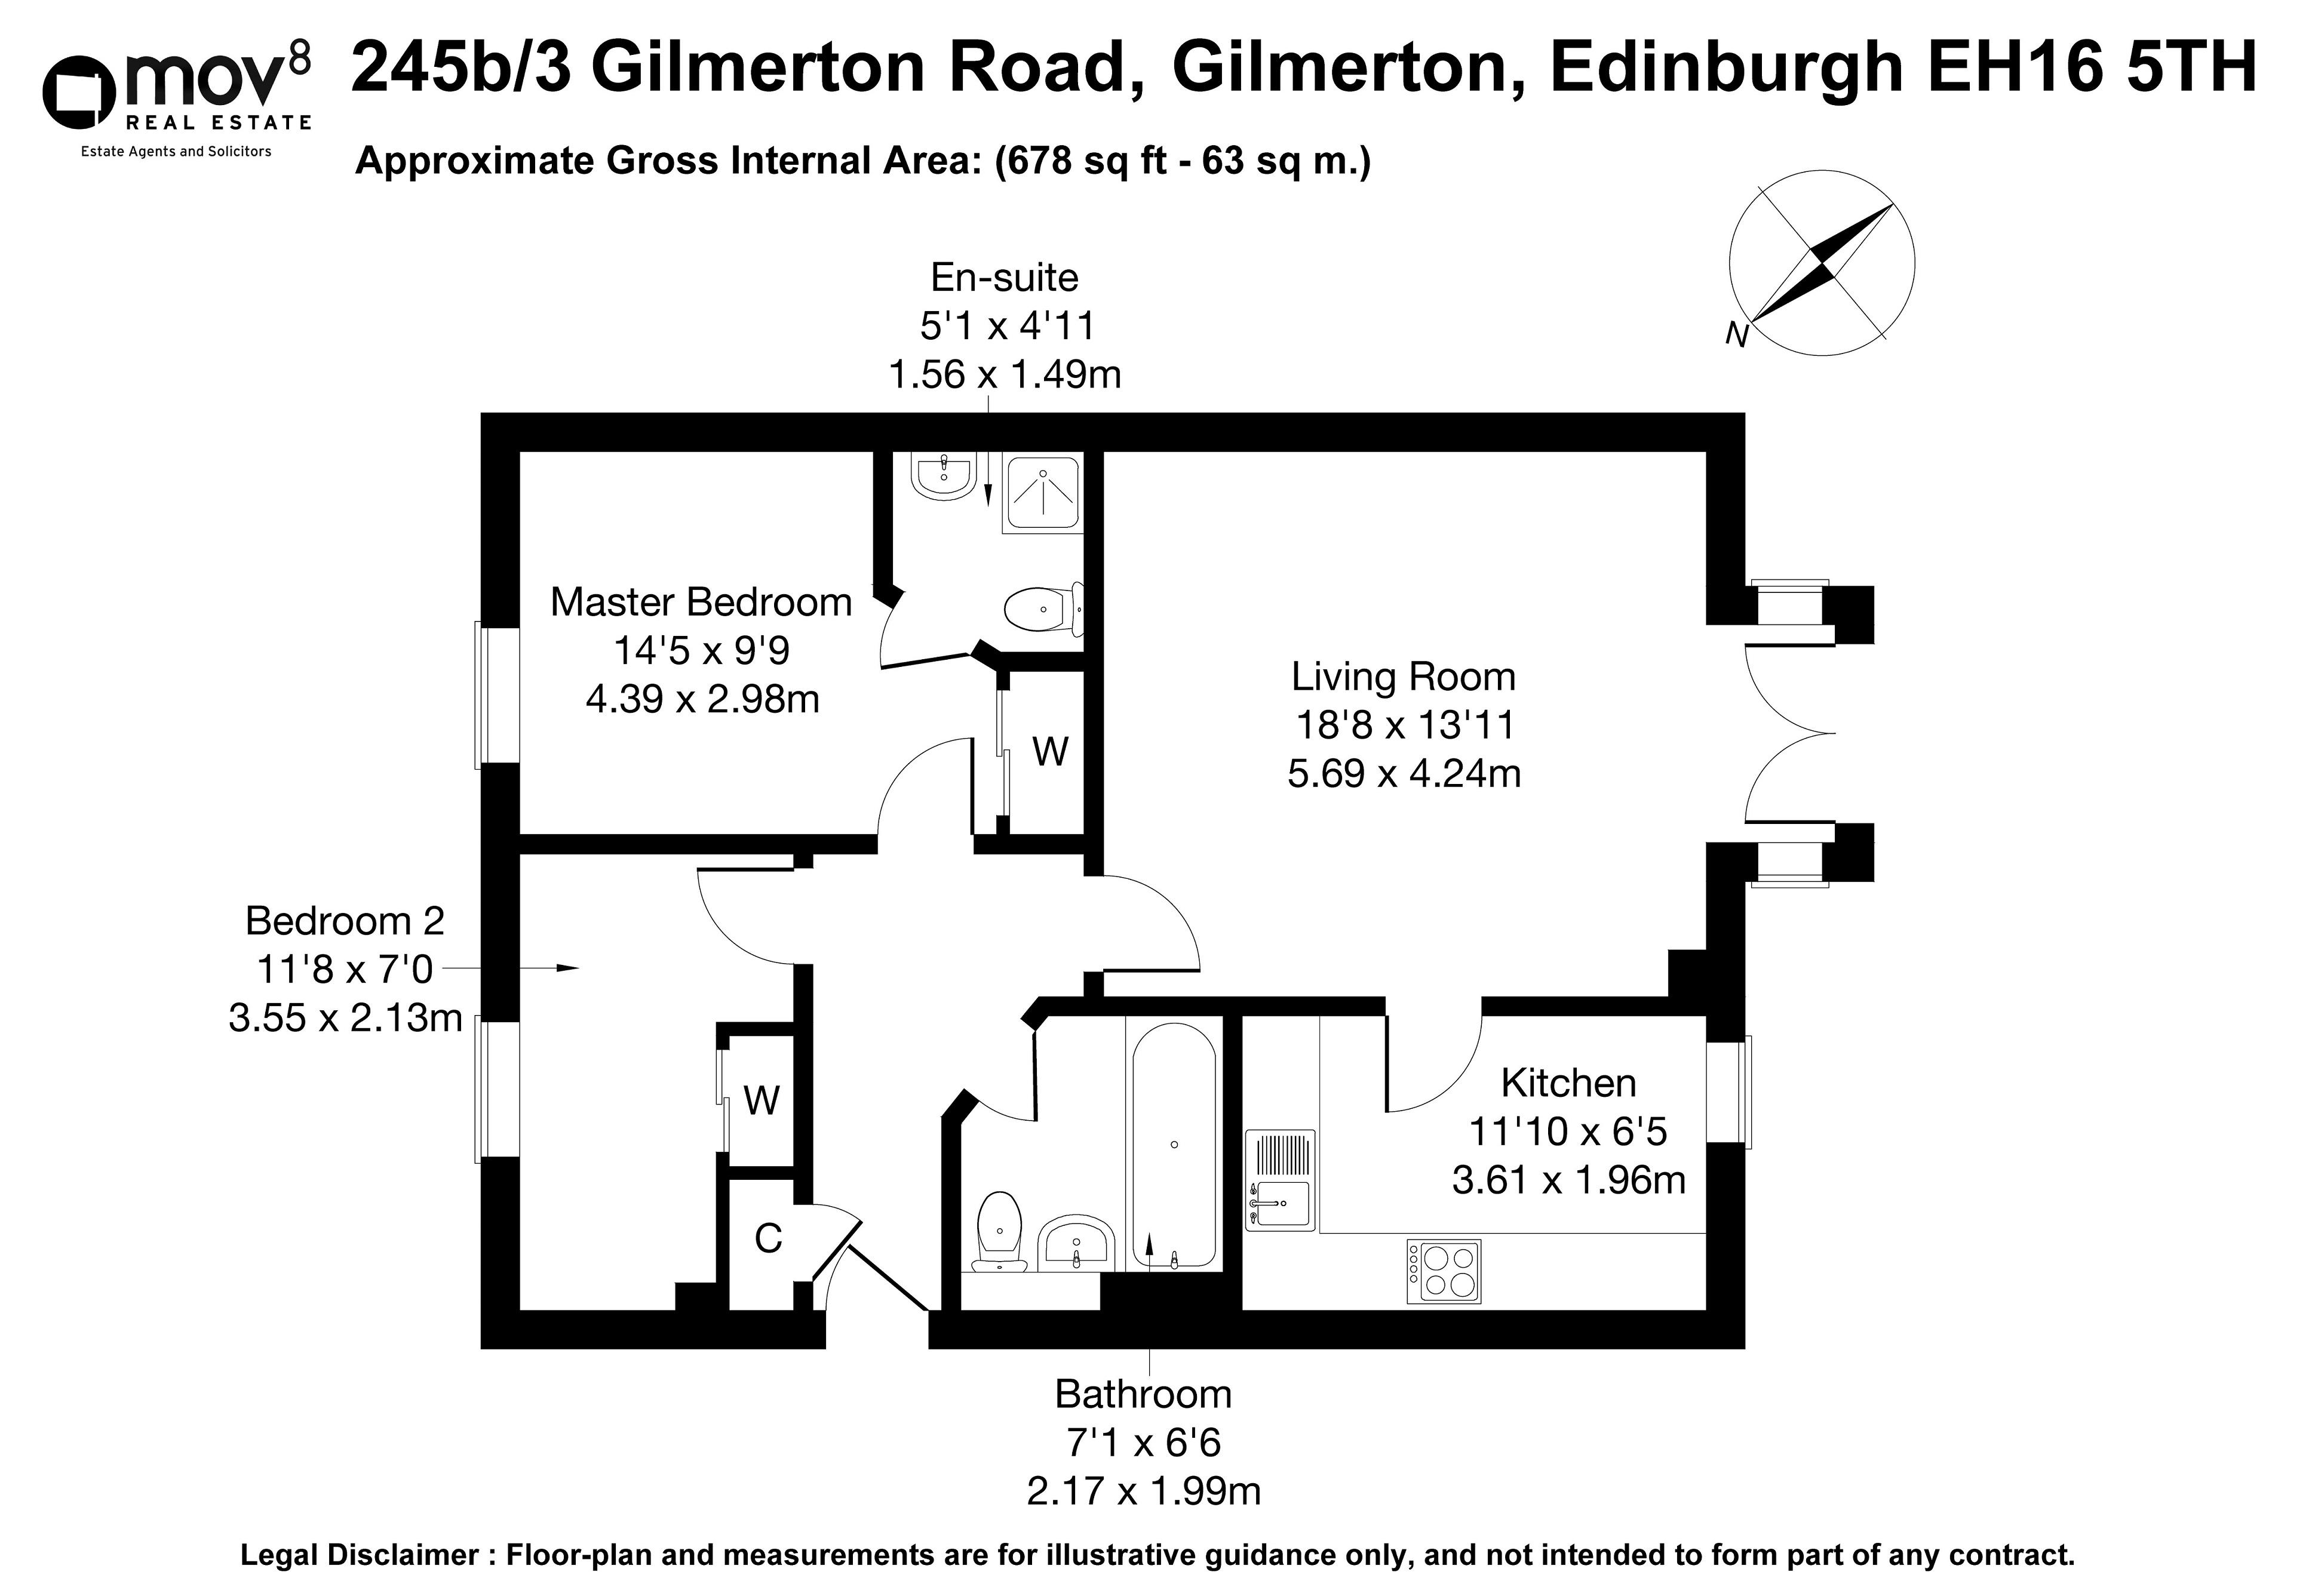 Floorplan 1 of 245b/3, Gilmerton Road, Gilmerton, Edinburgh, EH16 5TH